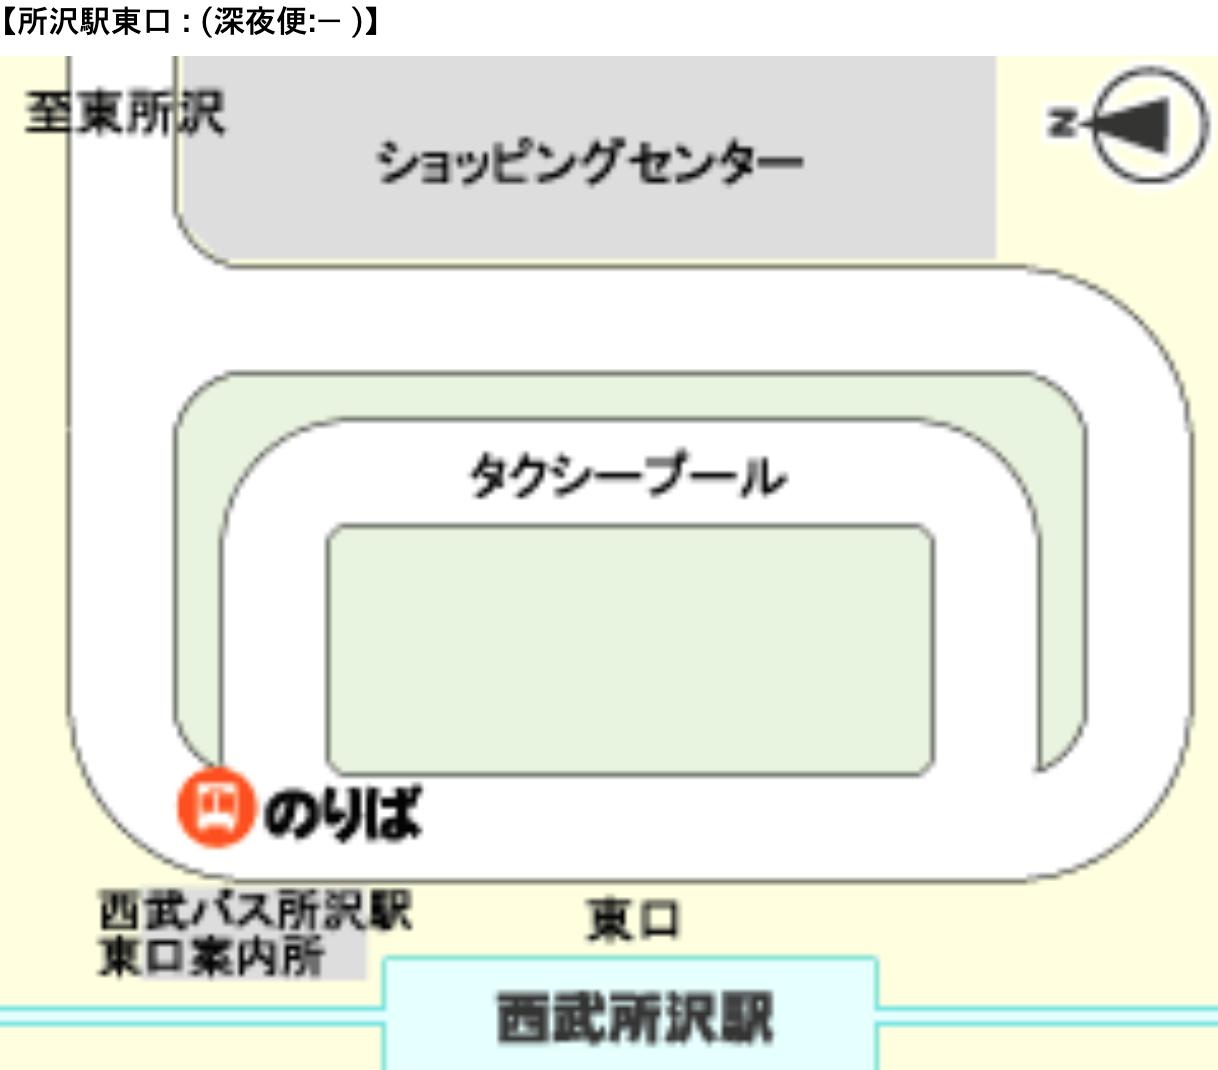 空港バス 所沢駅 案内図